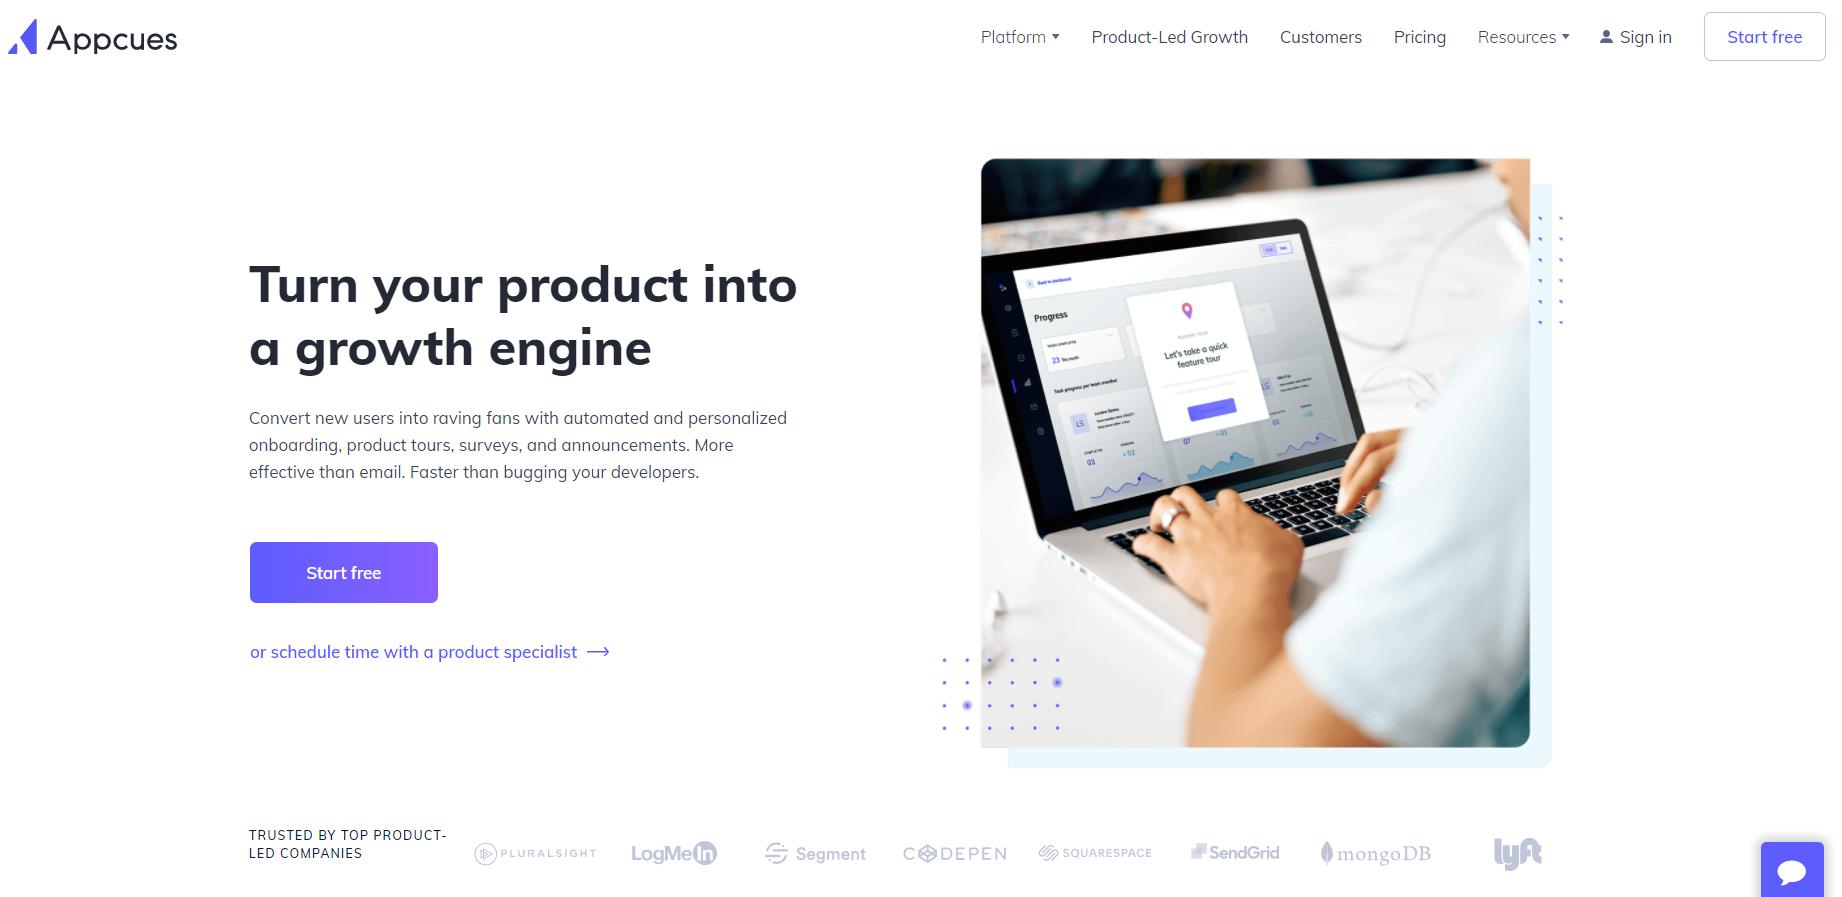 example of asymmetrical balance in website design